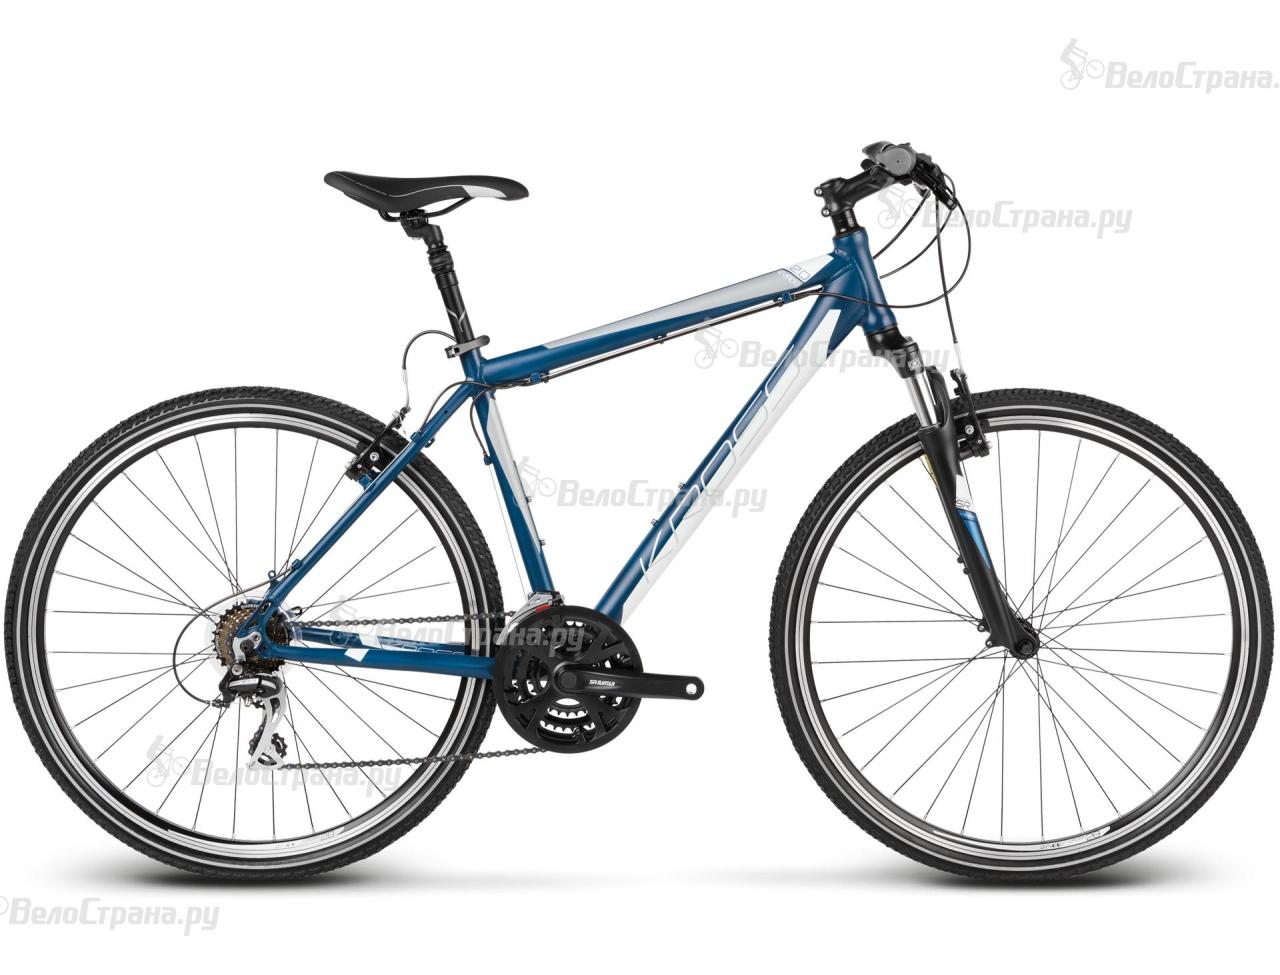 Велосипед Kross Evado 2.0 (2017) велосипед kross evado 1 0 lady 2017